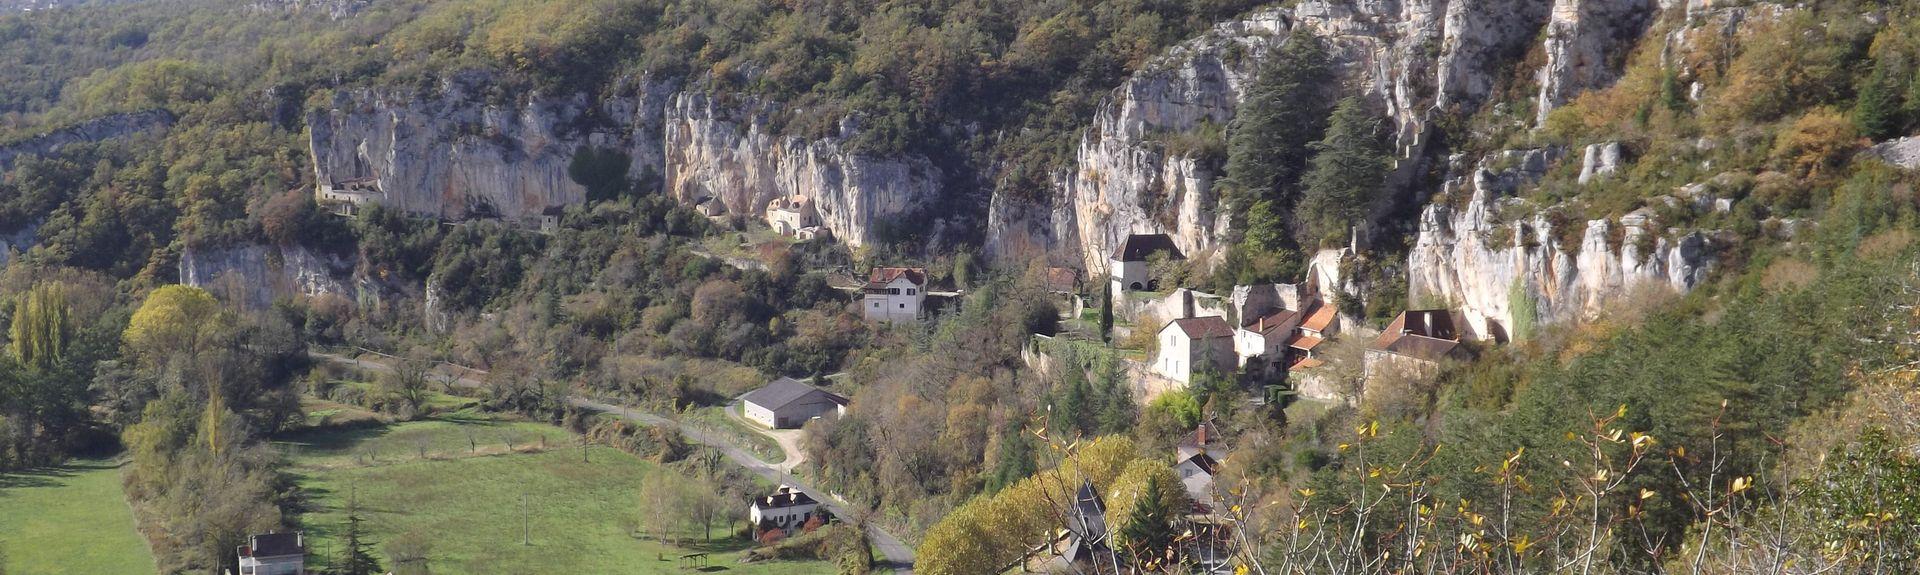 Ambeyrac, Aveyron, France